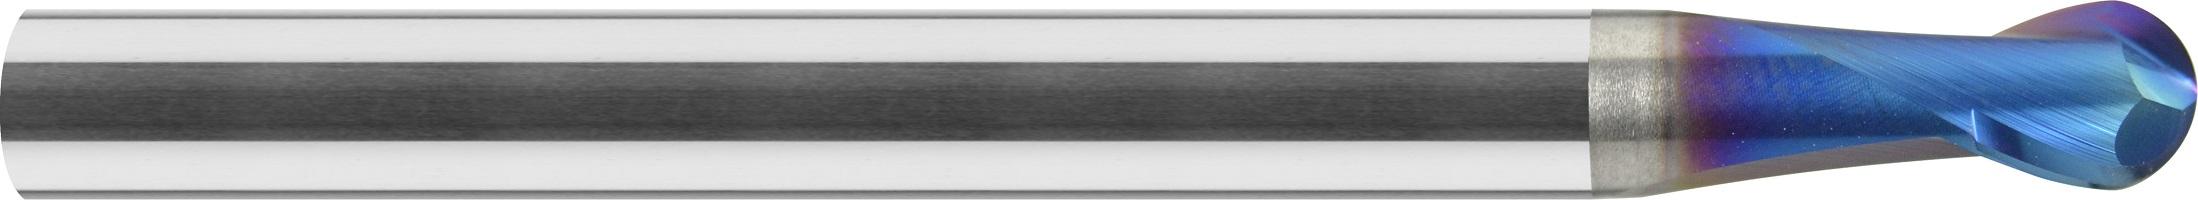 Minifrez kula, Z-2, HA, HSC, 65 HRC, PrimeLine, VHM NACO BLUE (453)